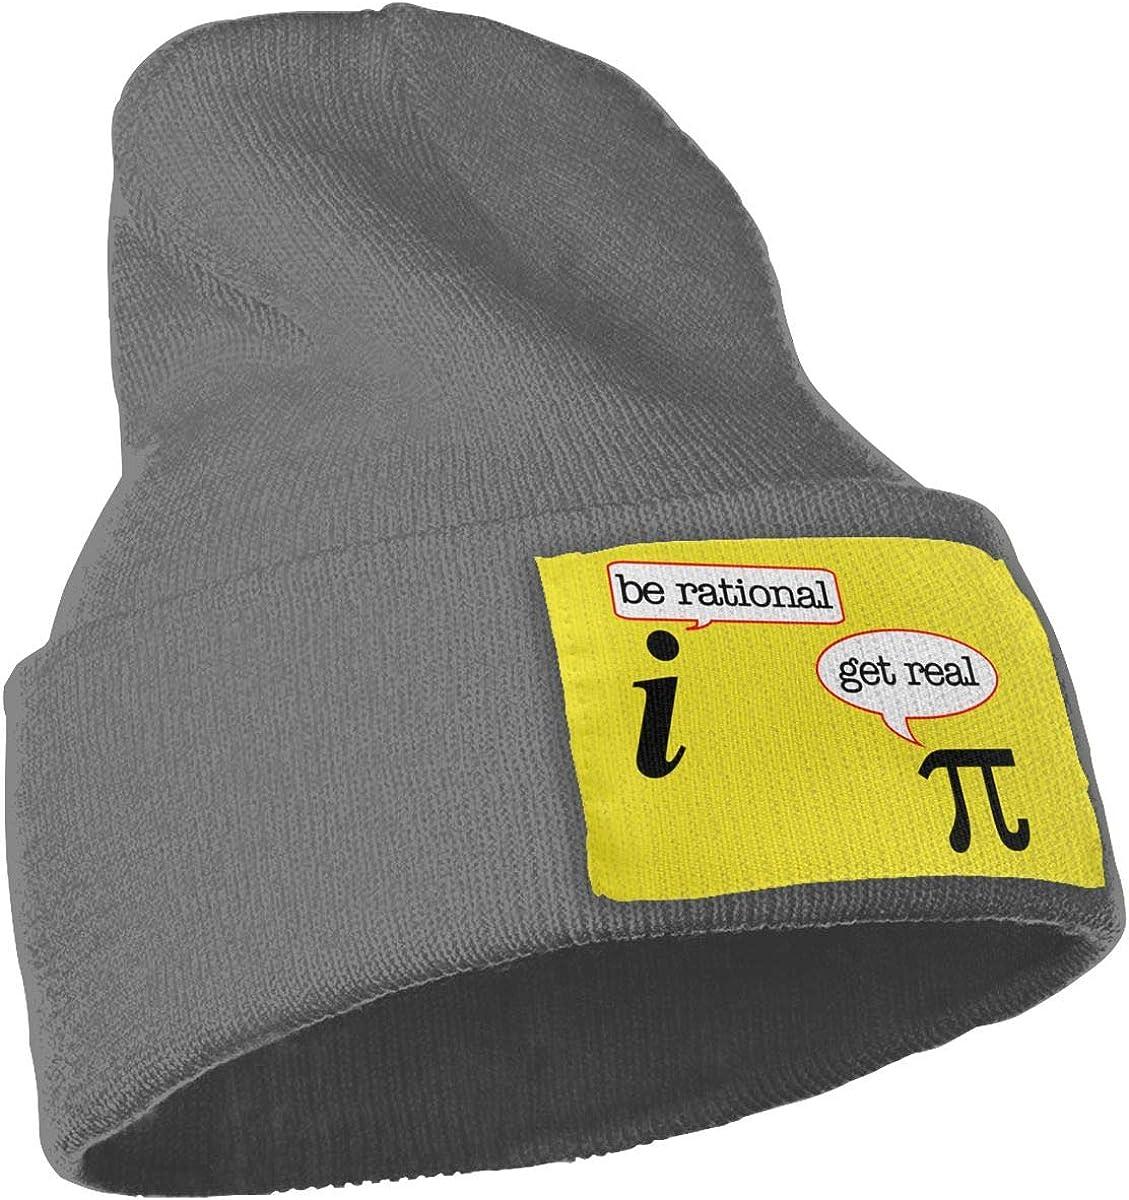 Get Real Be Rational Wool Cap Beanies Caps Unisex Winter Deep Heather